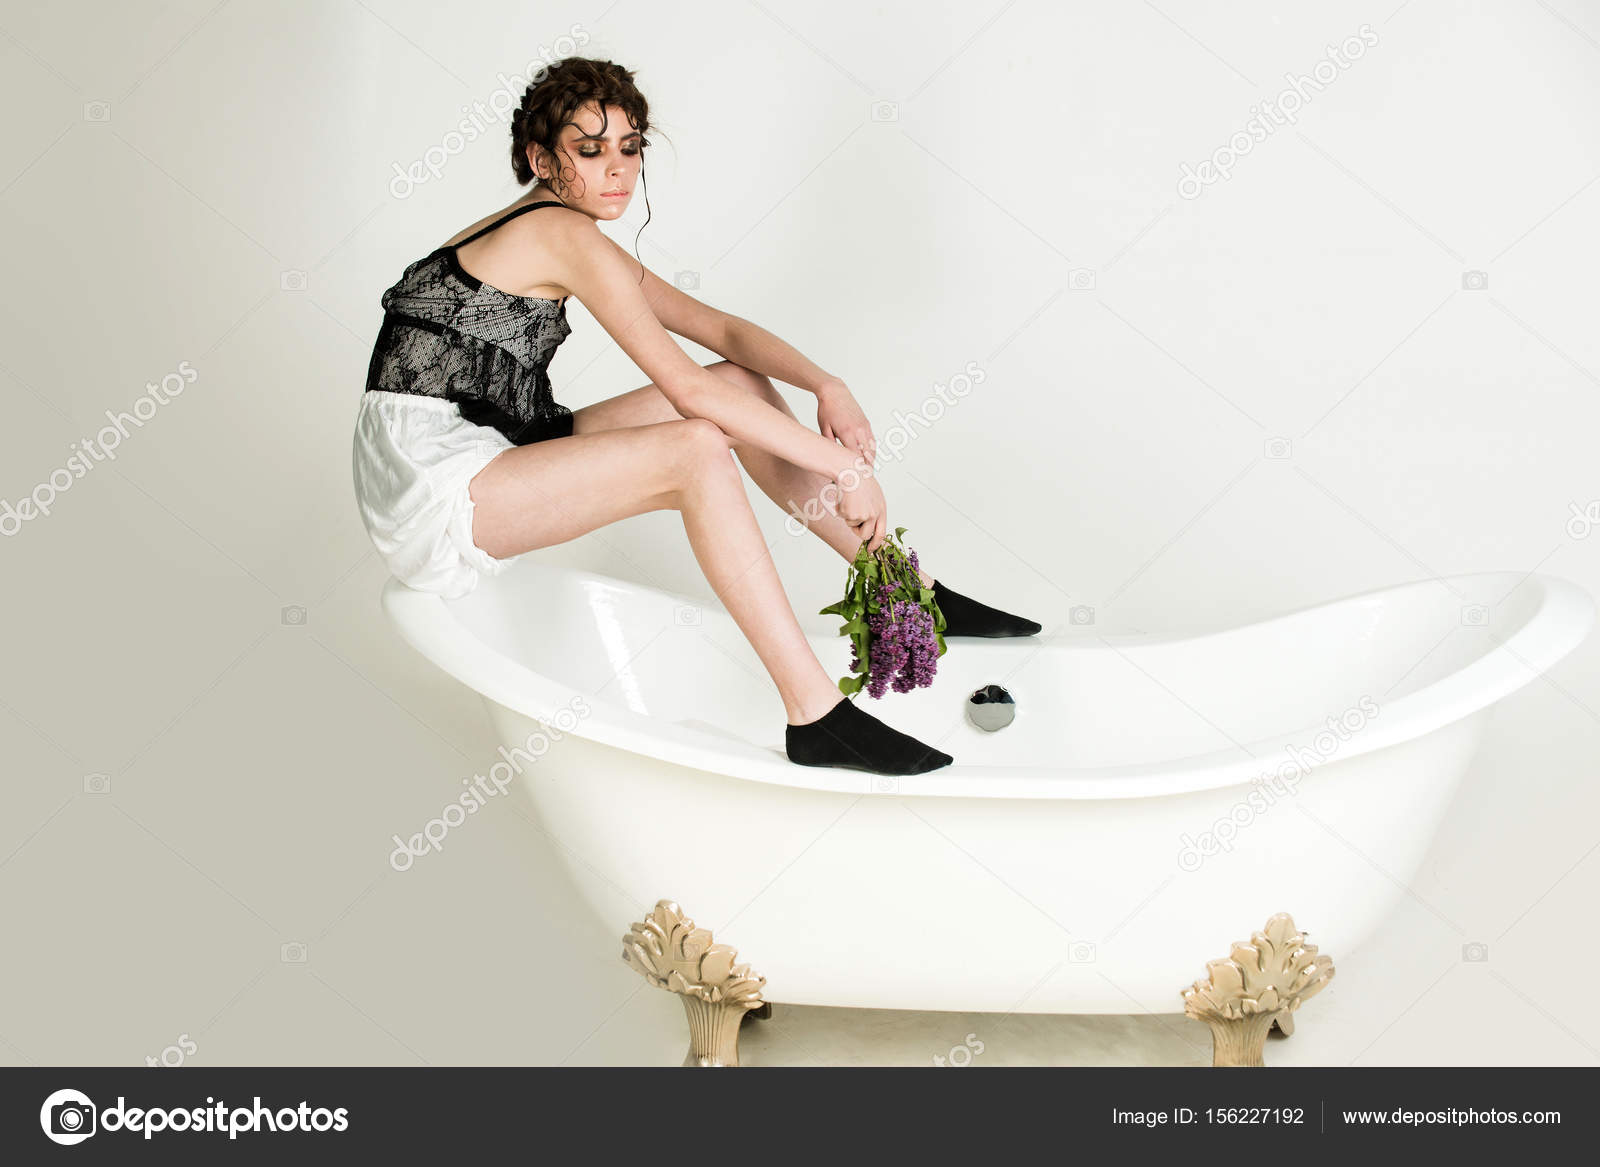 Vasca Da Bagno Piccola Vintage : Donna che si siede sulla vasca da bagno vuota vintage con mazzo